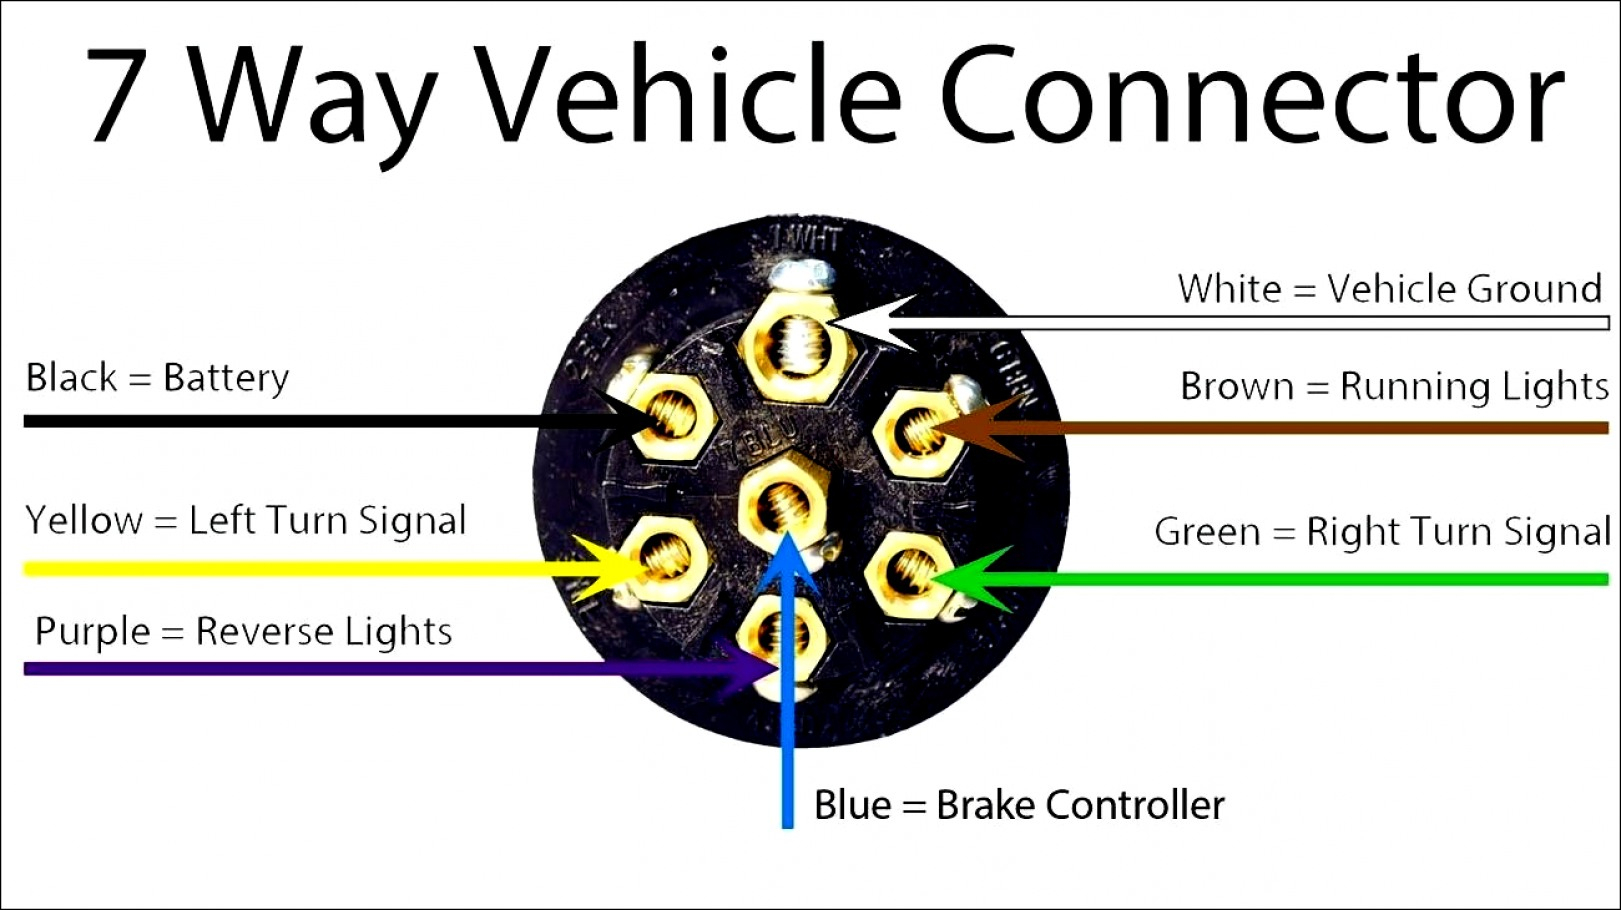 7 Way Wiring Diagram - Wiring Diagrams Thumbs - 7 Way Wiring Diagram